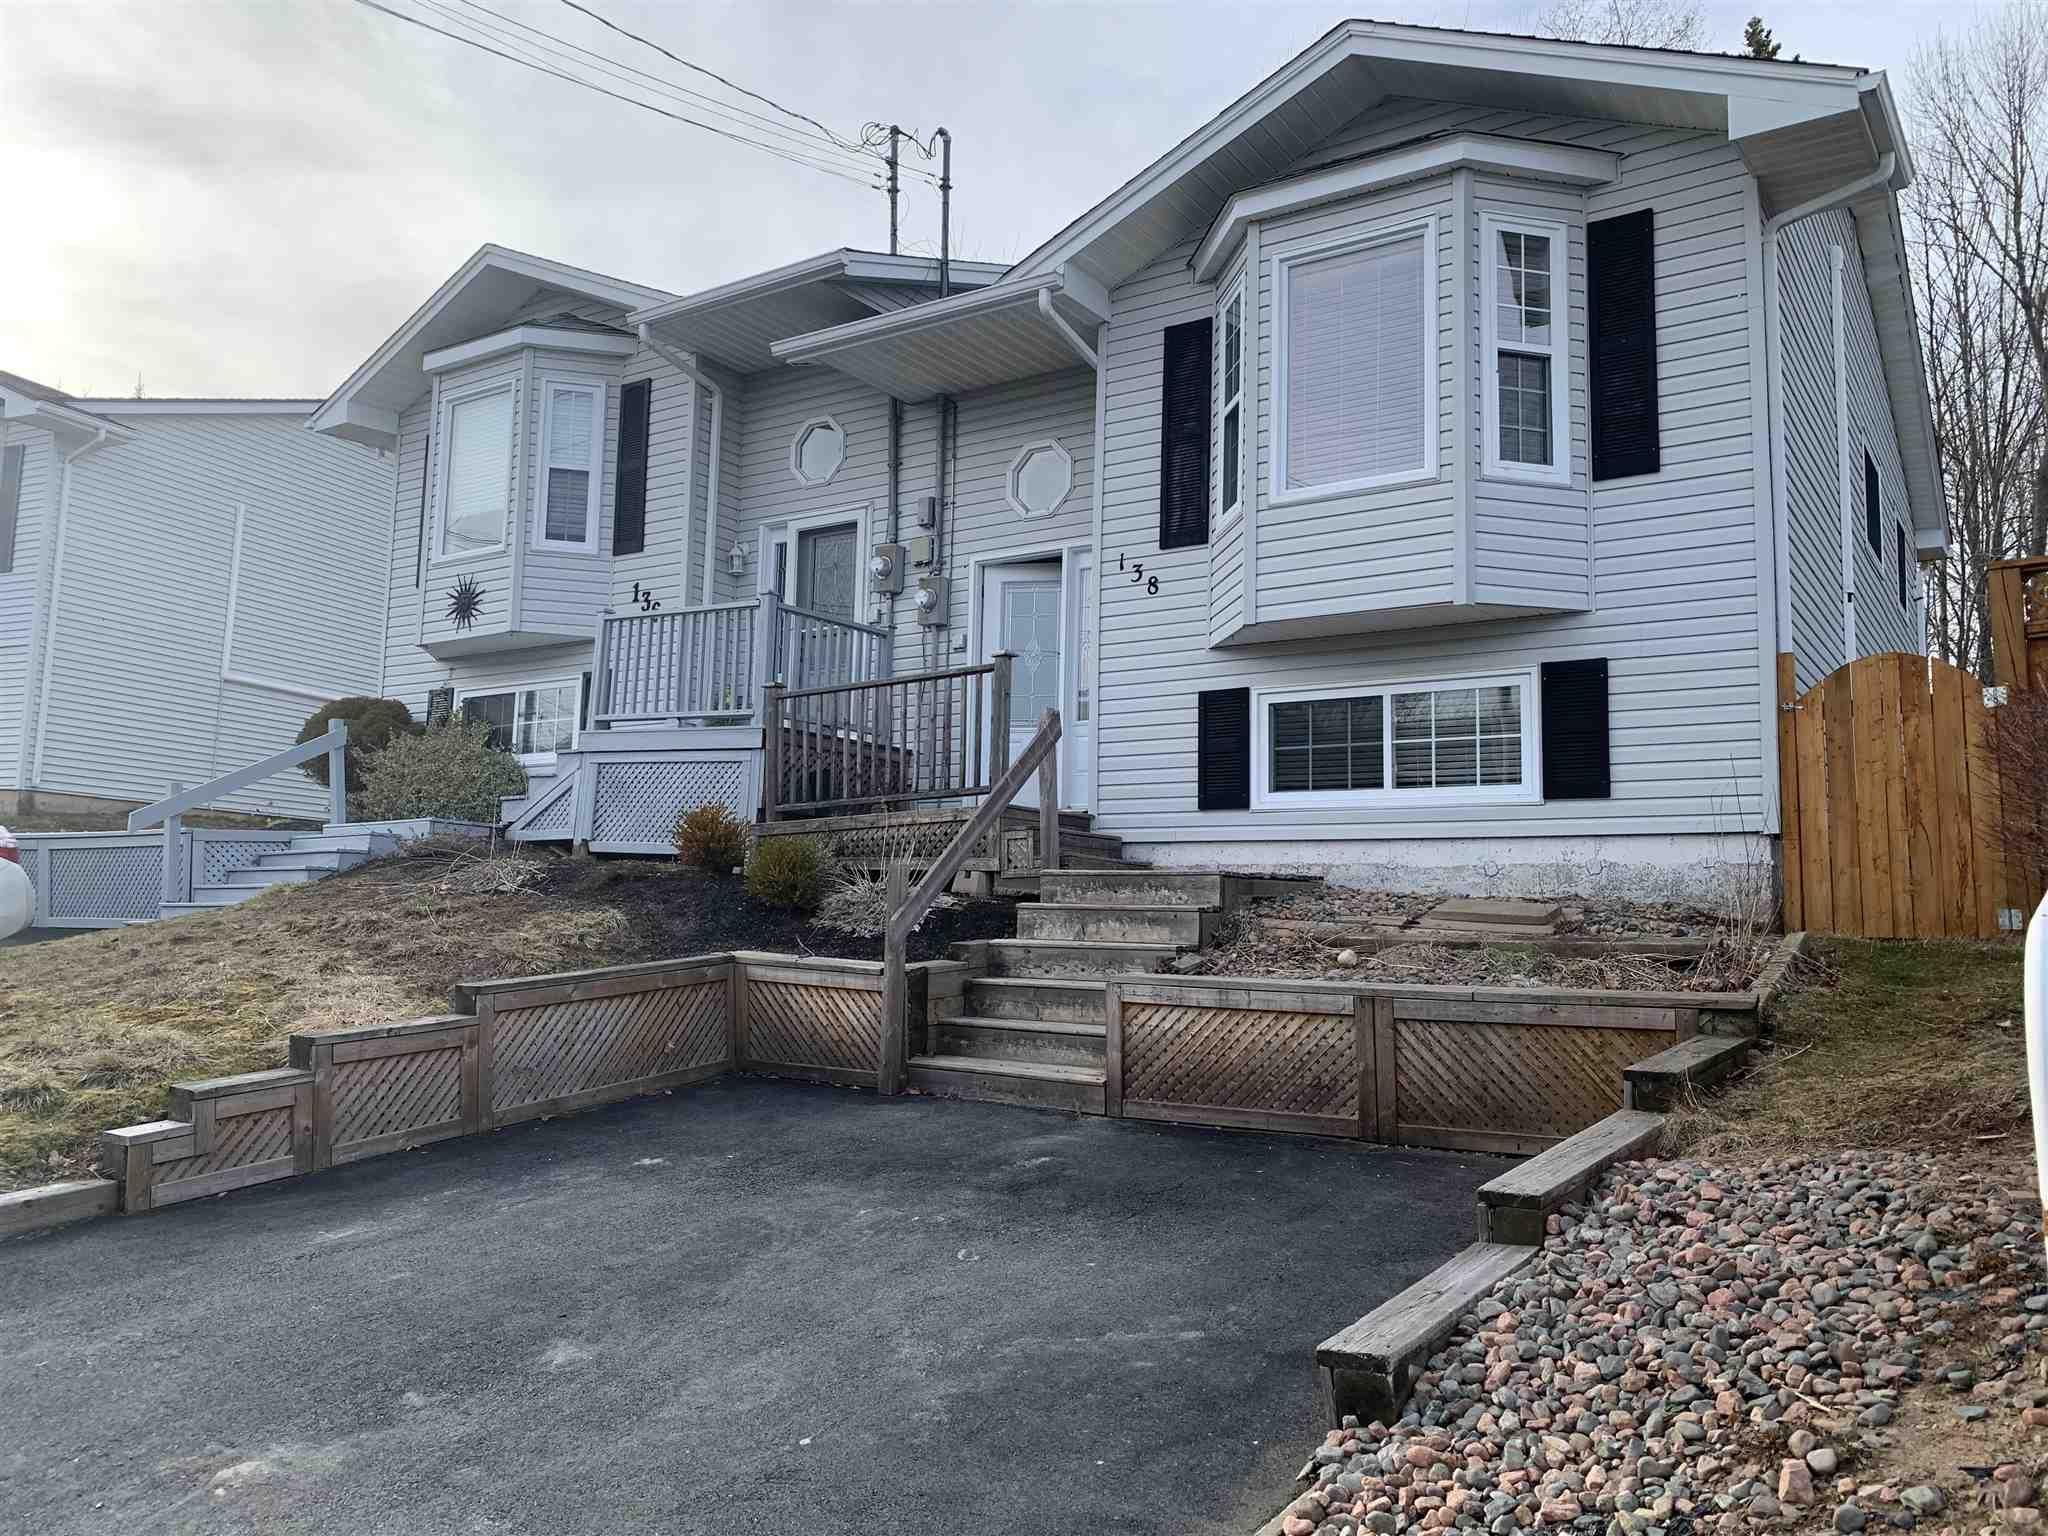 Main Photo: 138 Lumberman Drive in Lower Sackville: 25-Sackville Residential for sale (Halifax-Dartmouth)  : MLS®# 202106165